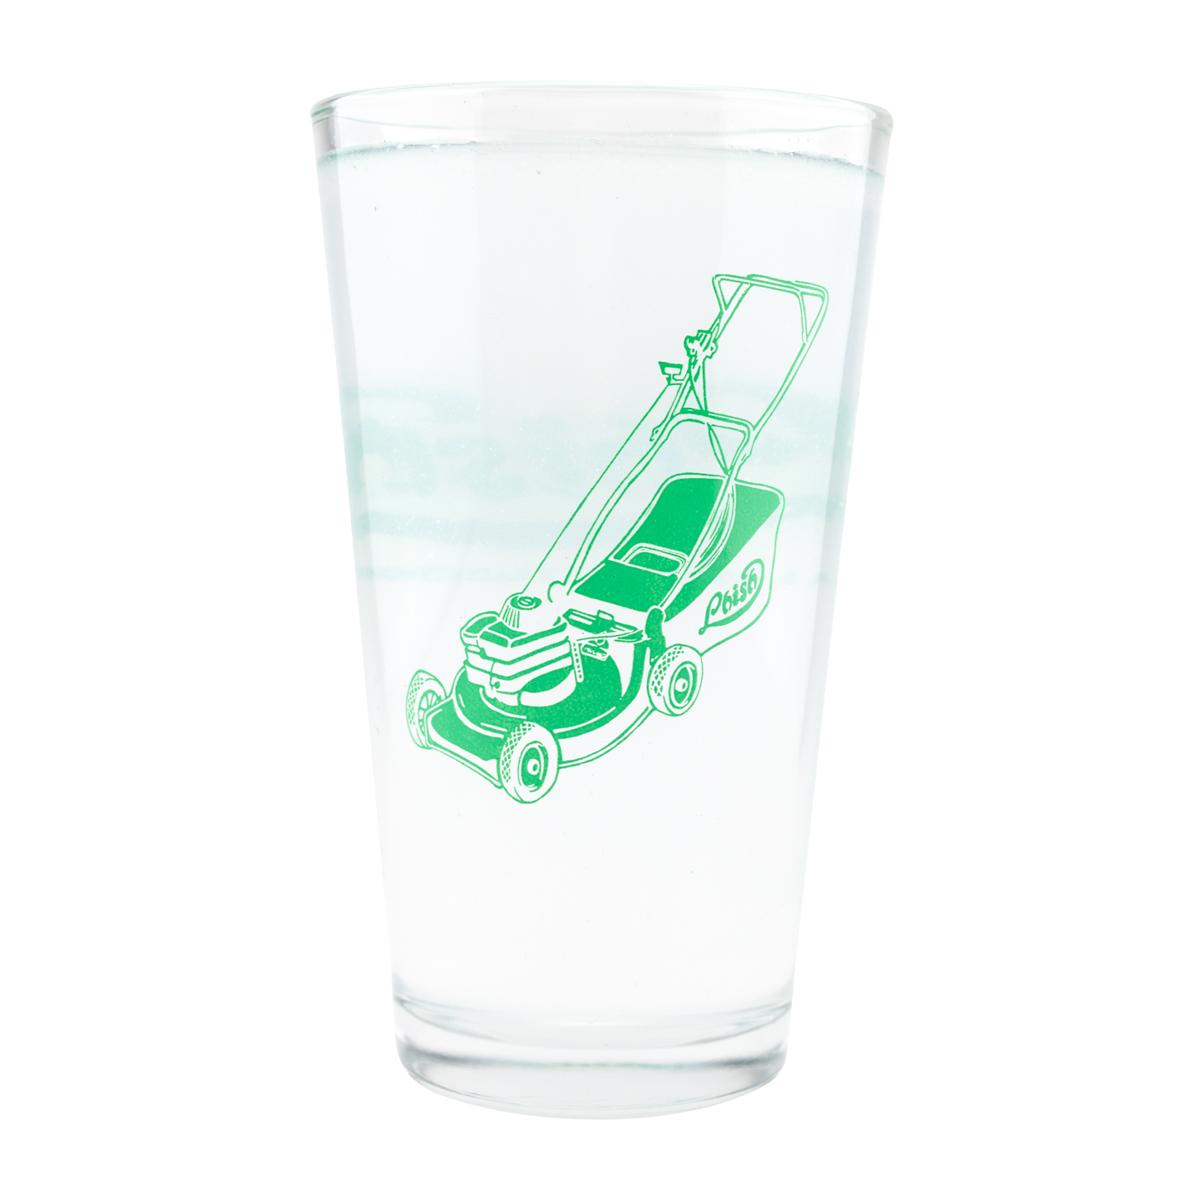 Backyard Tradition Pint Glass